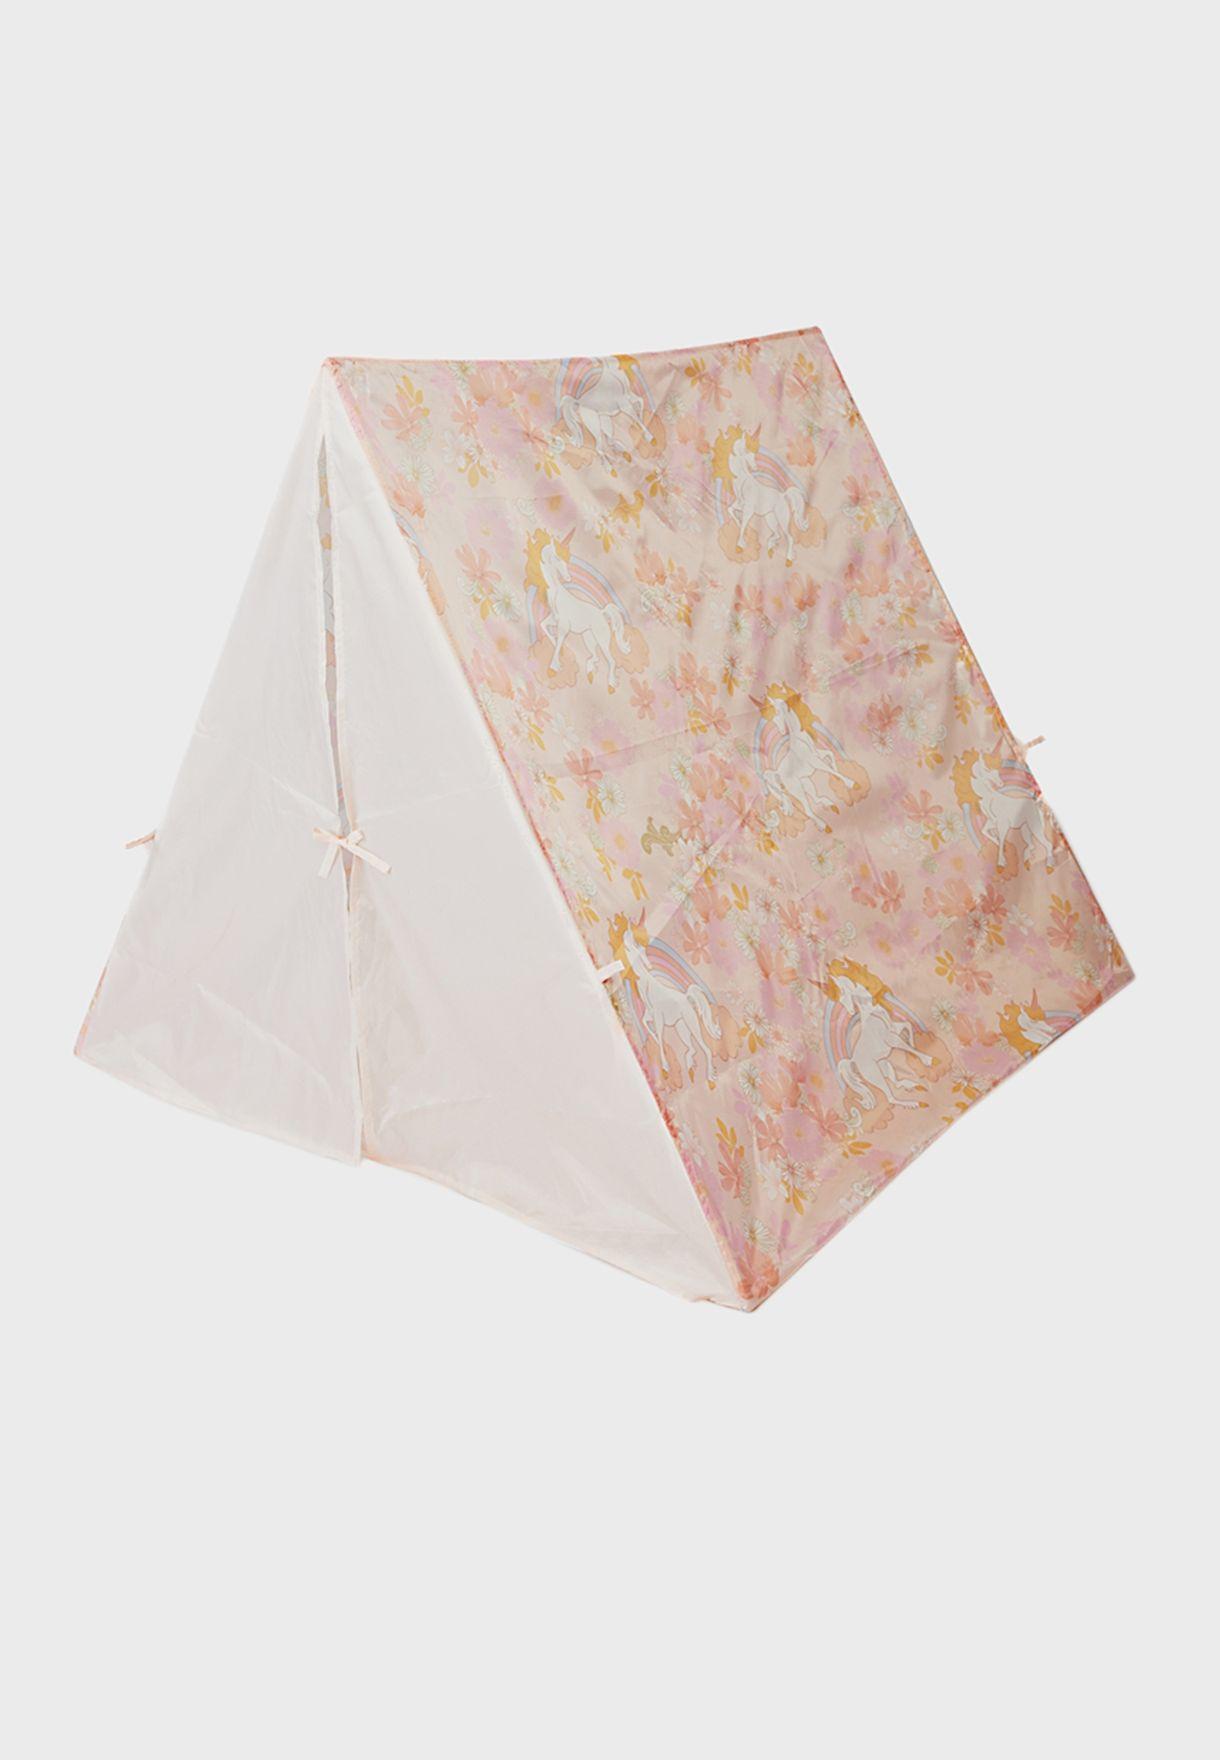 Kids Unicorn Print Play Tent